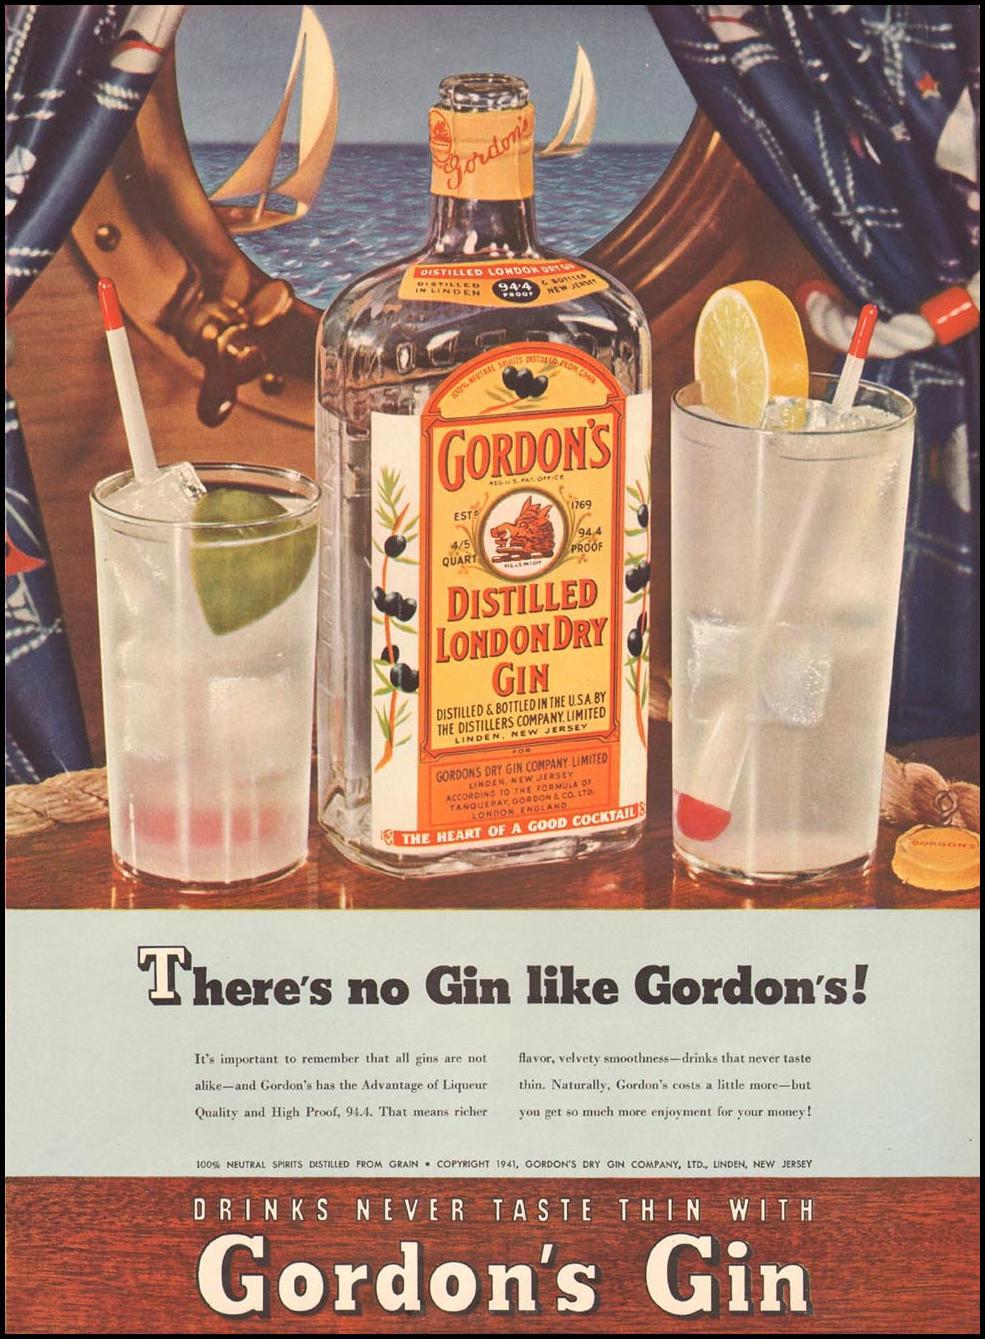 GORDON'S DISTILLED LONDON DRY GIN LIFE 08/04/1941 p. 43